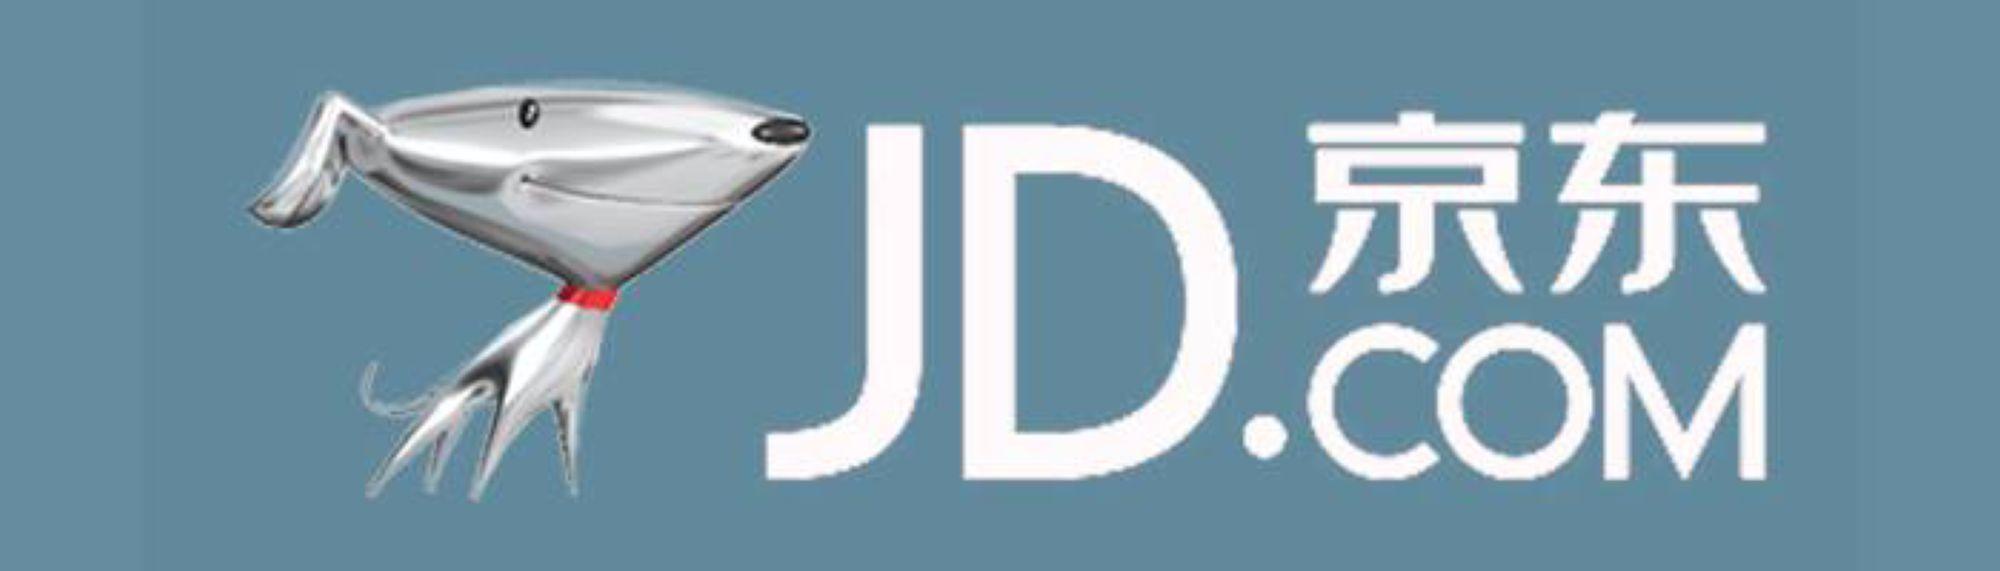 Testo JD